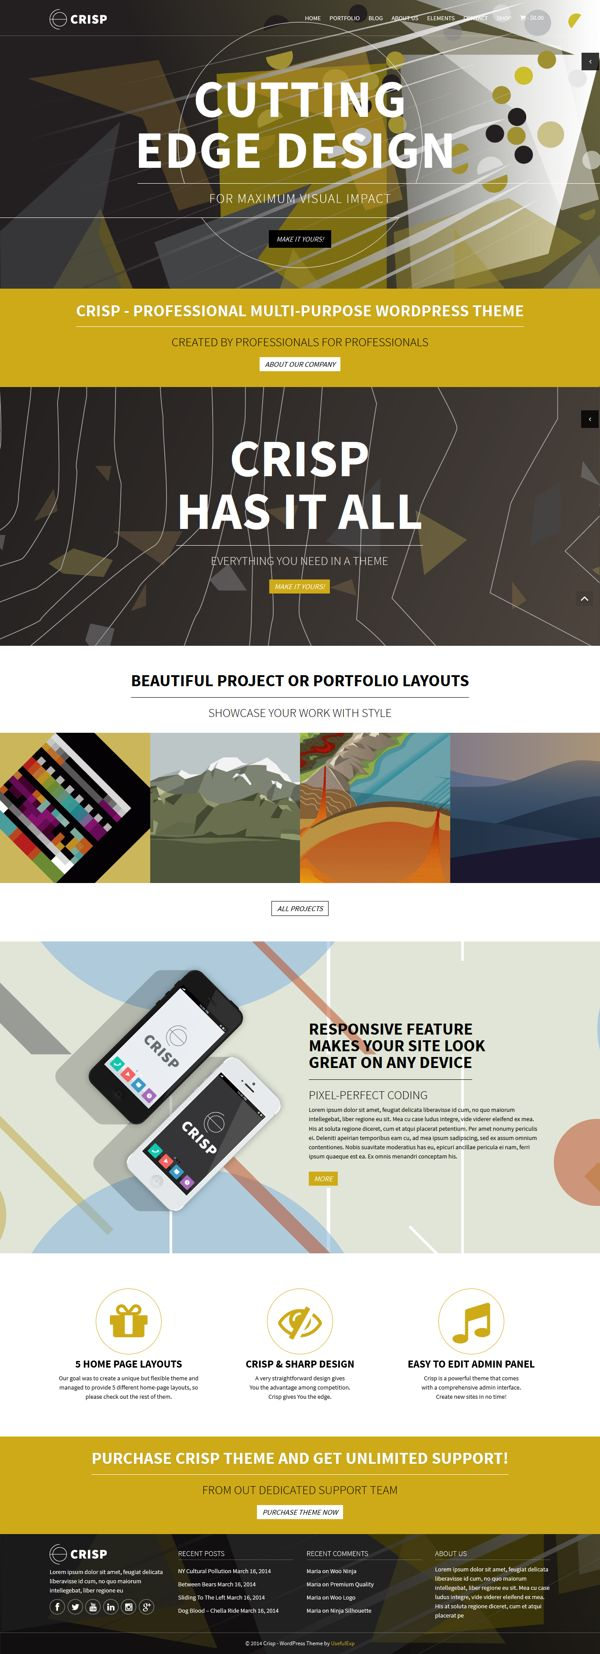 Crisp Multi-Purpose Wordpress Theme | #webdesign #it #web #design #layout #userinterface #website #webdesign < repinned by www.BlickeDeeler.de | Visit our website www.blickedeeler.de/leistungen/webdesign